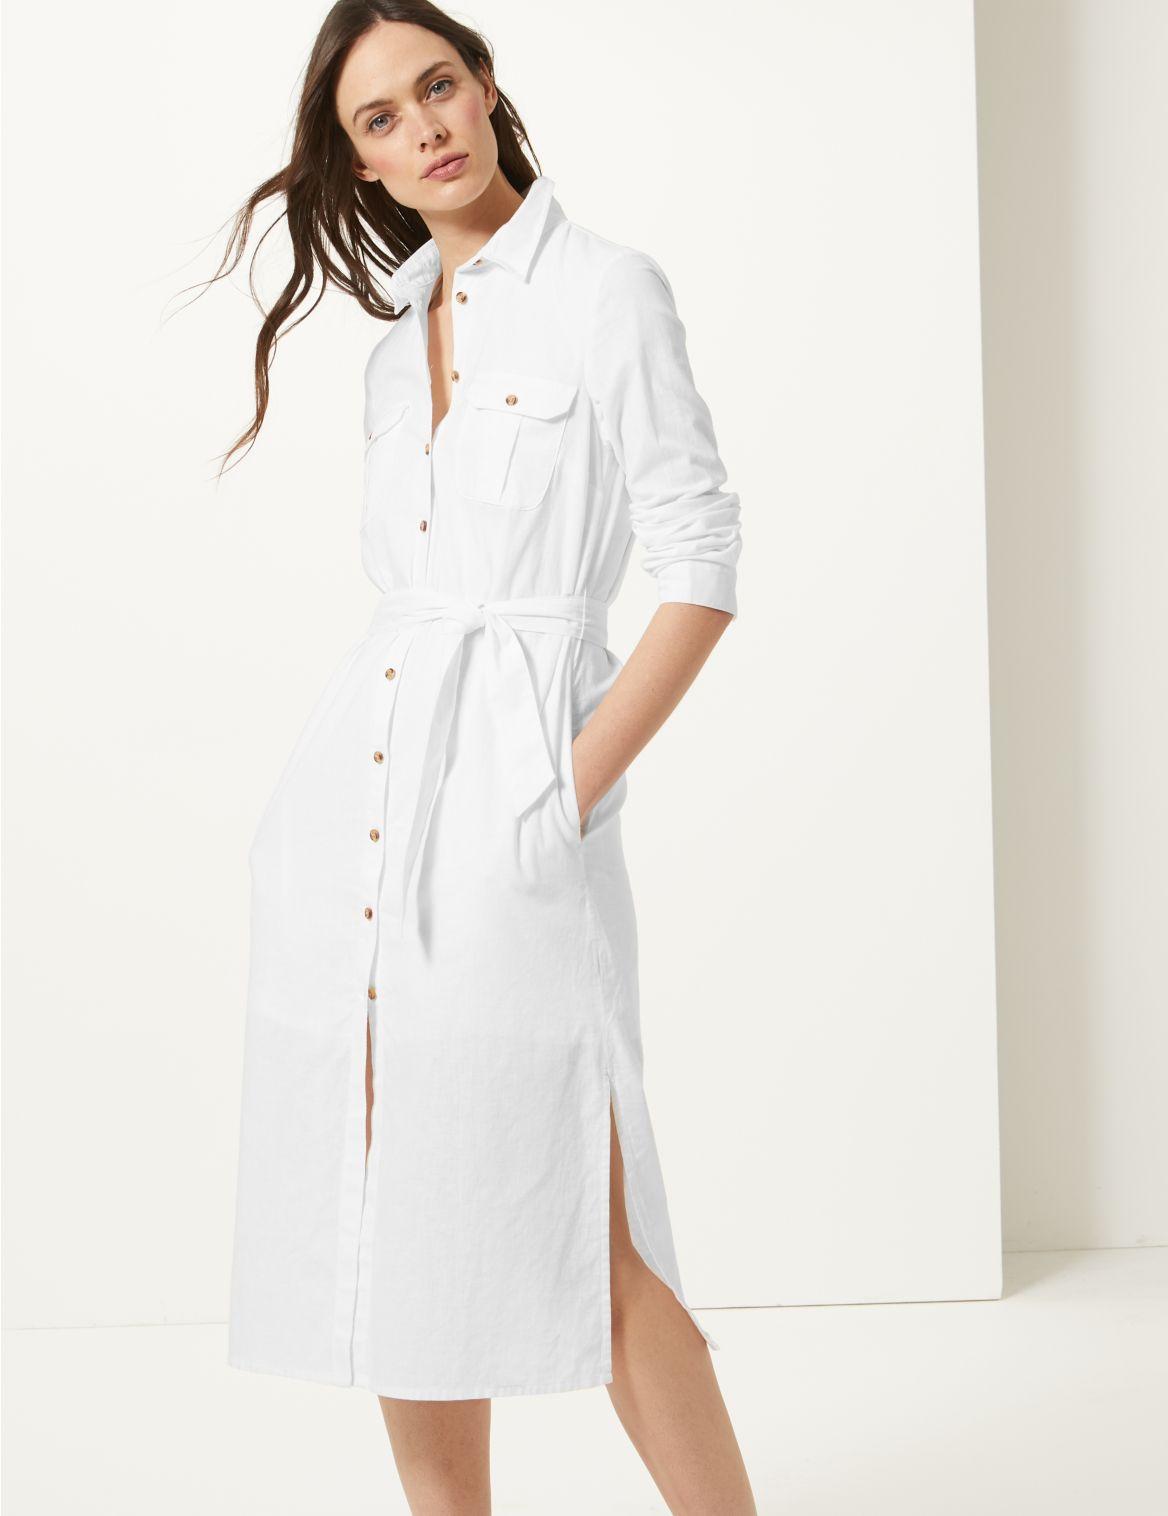 Patch Pocket Midi Shirt Dress soft white